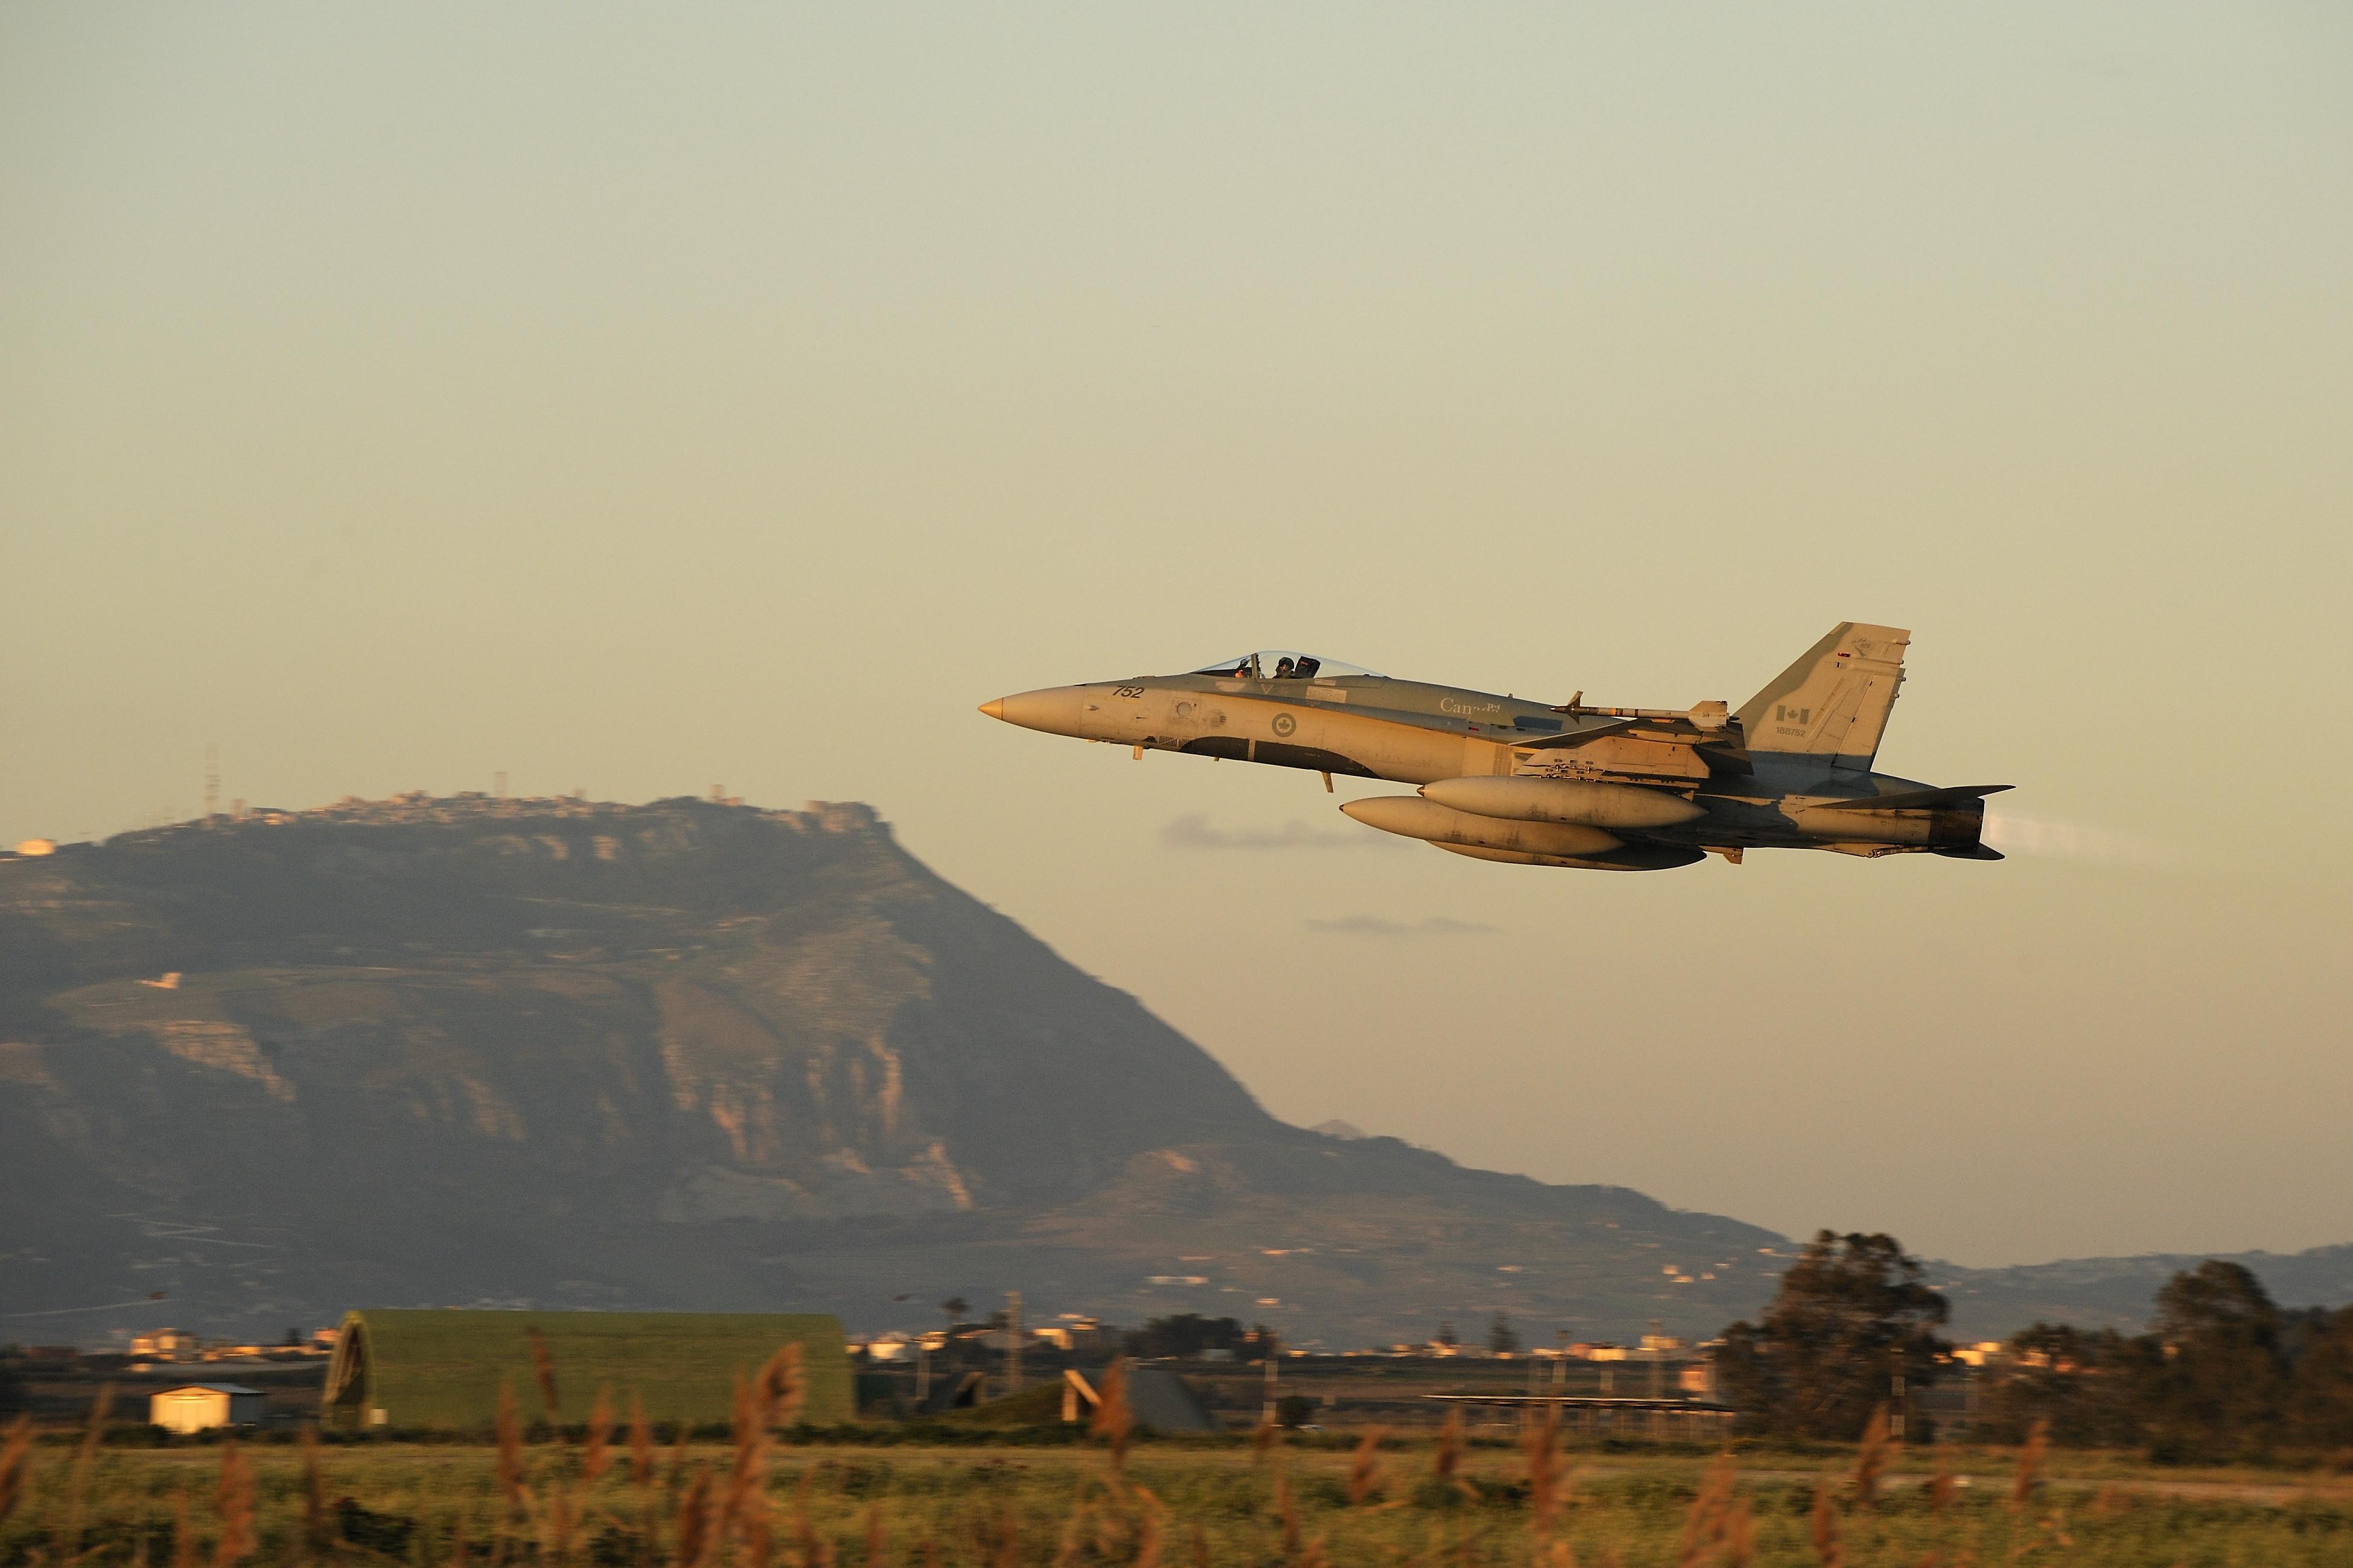 McDonnell Douglas CF-18 Hornet wallpapers HD quality